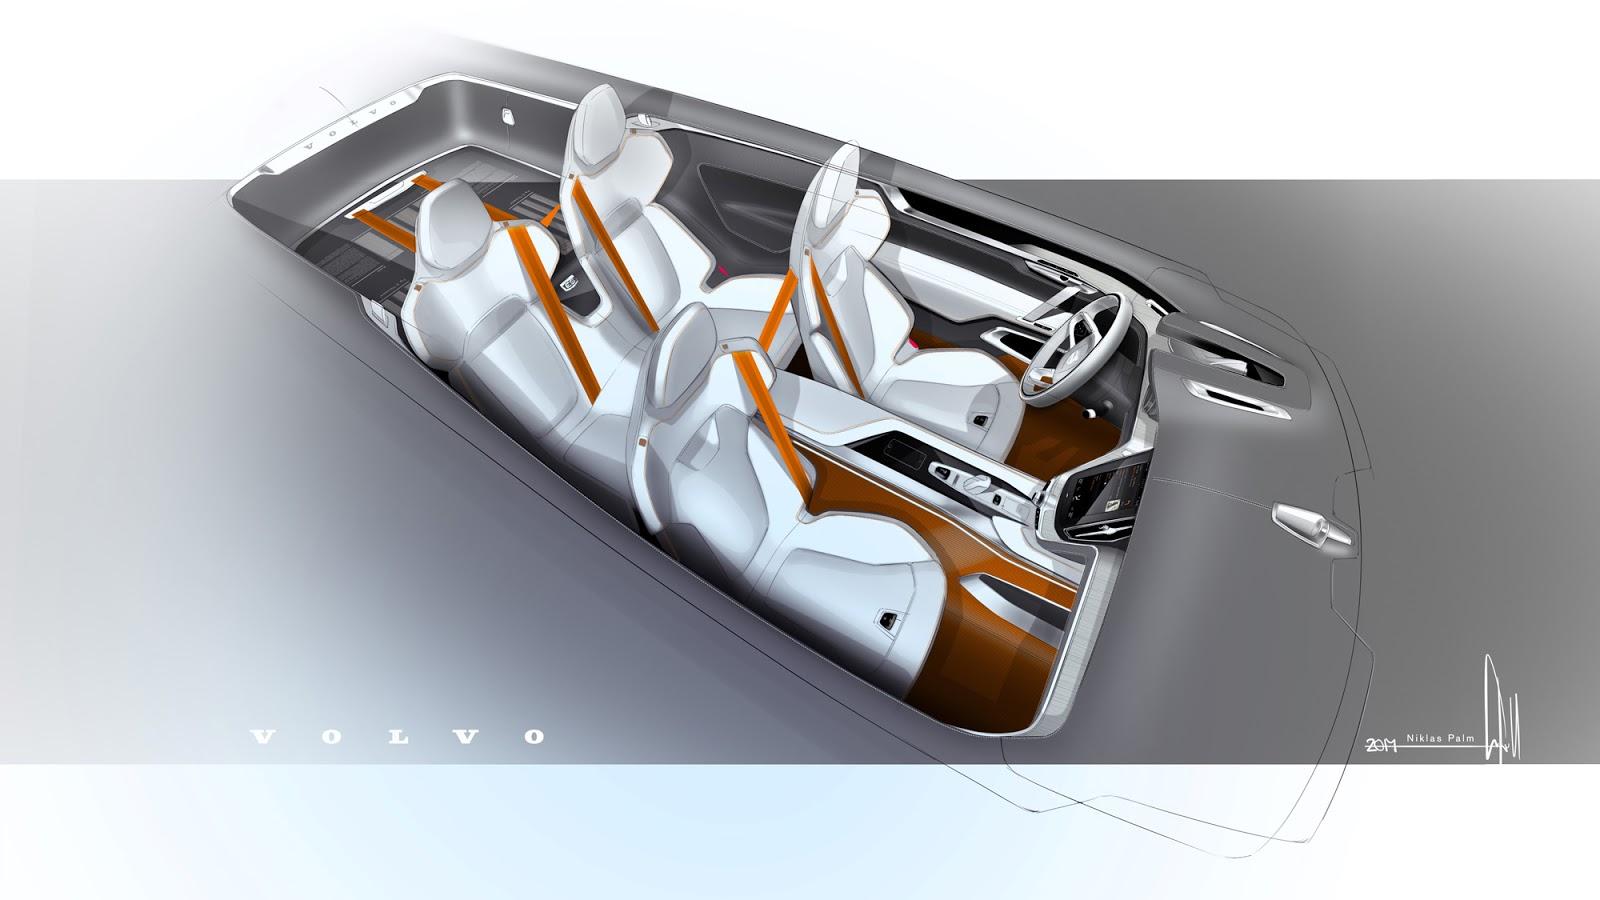 Volvo Concept Estate sketch interior view by Niklas Palm